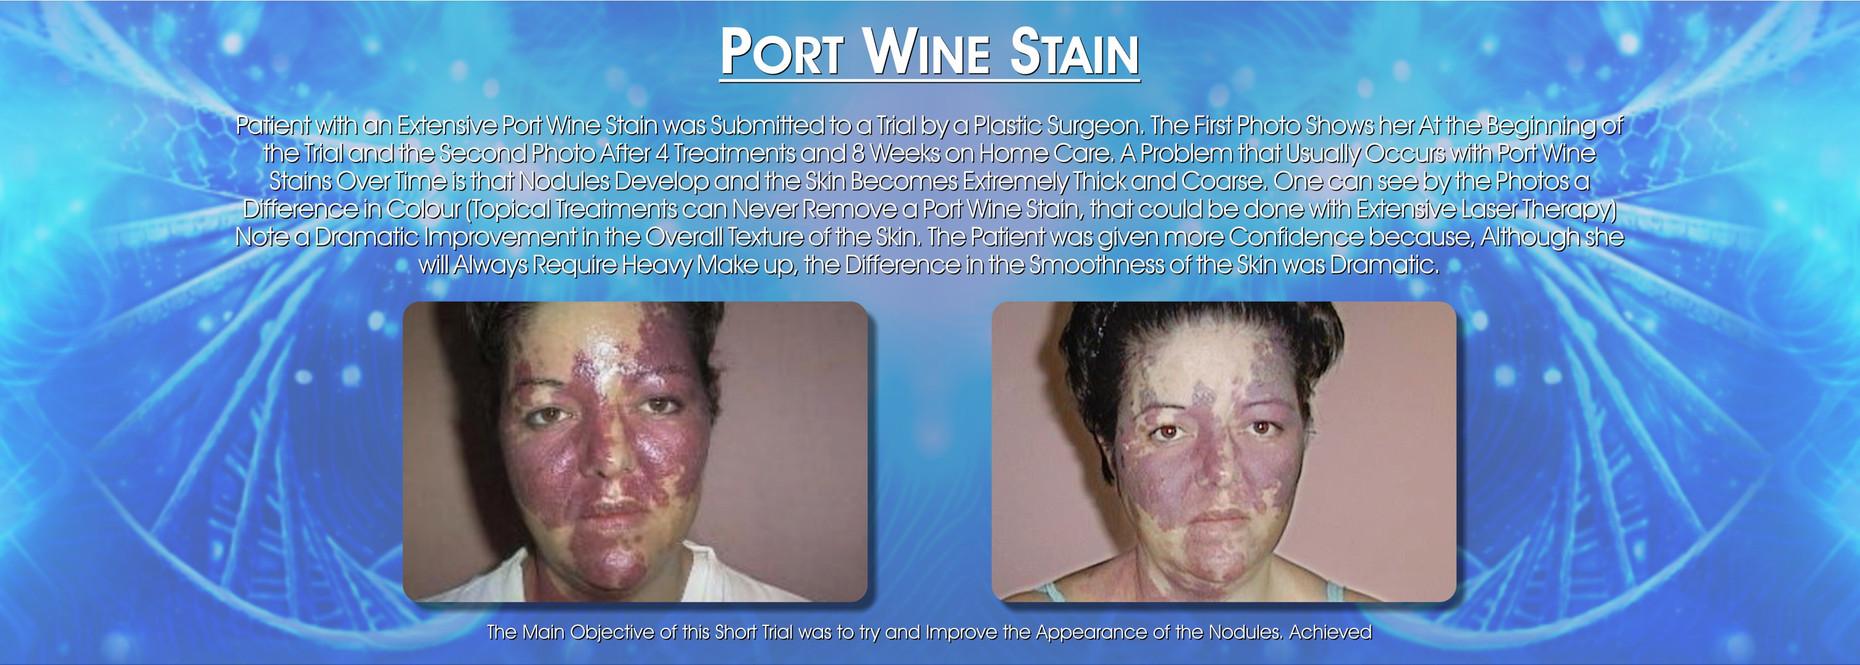 Port Wine Stain